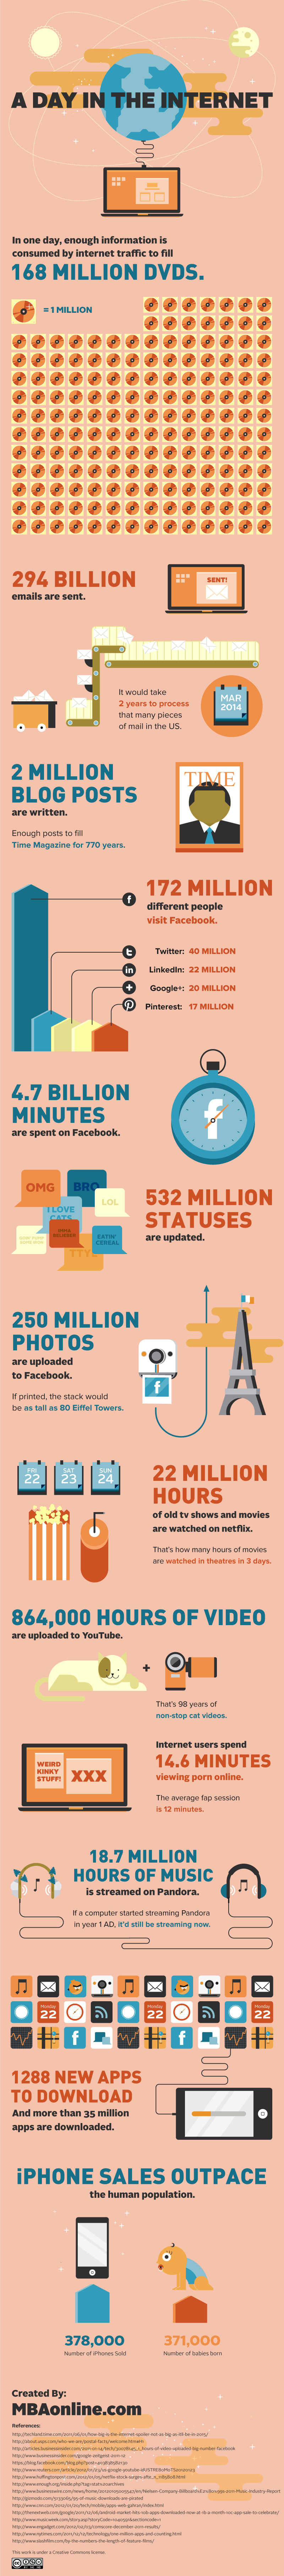 Internet statistics, Infographic